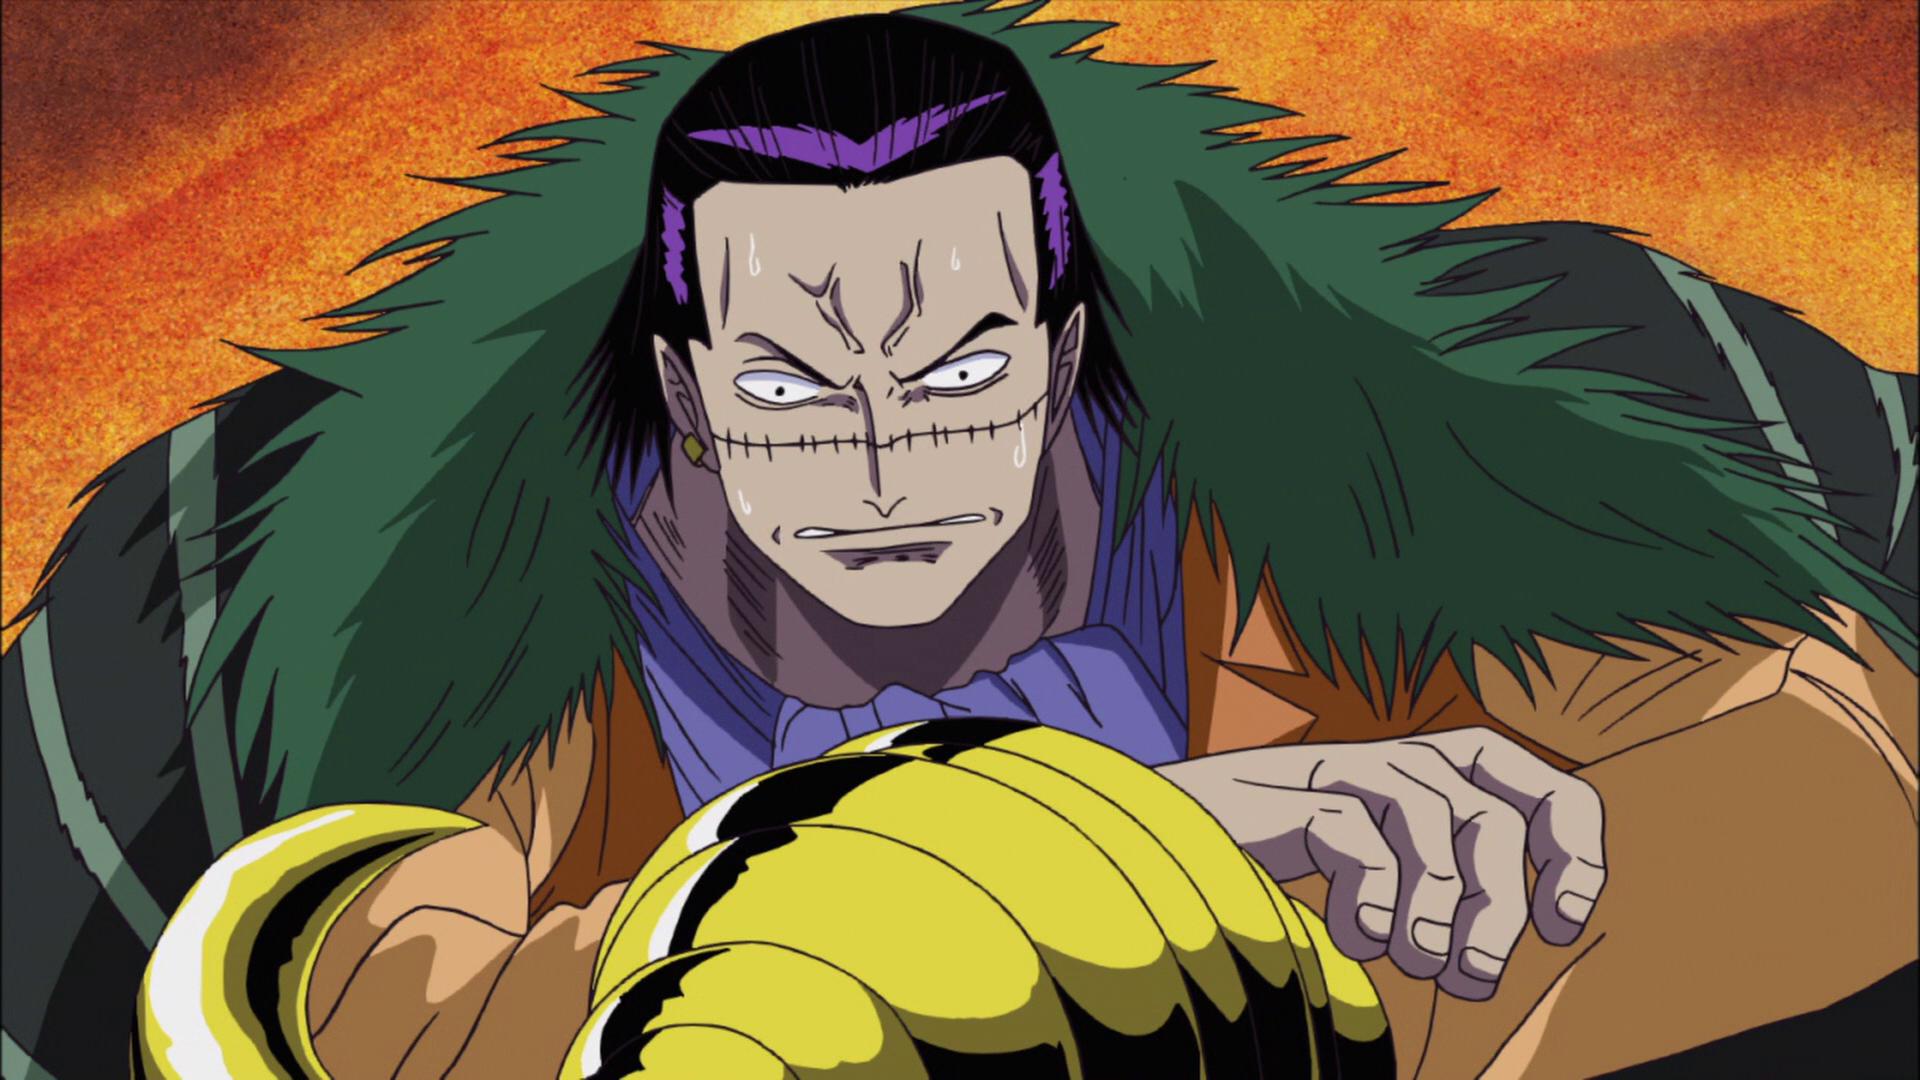 #Crocodile #SirCrocodile #Mr0 #sunasunanomi #Shichibukai #BaroqueWorks #onepiece #pirate #pirata #gancho #anime #manga #oda